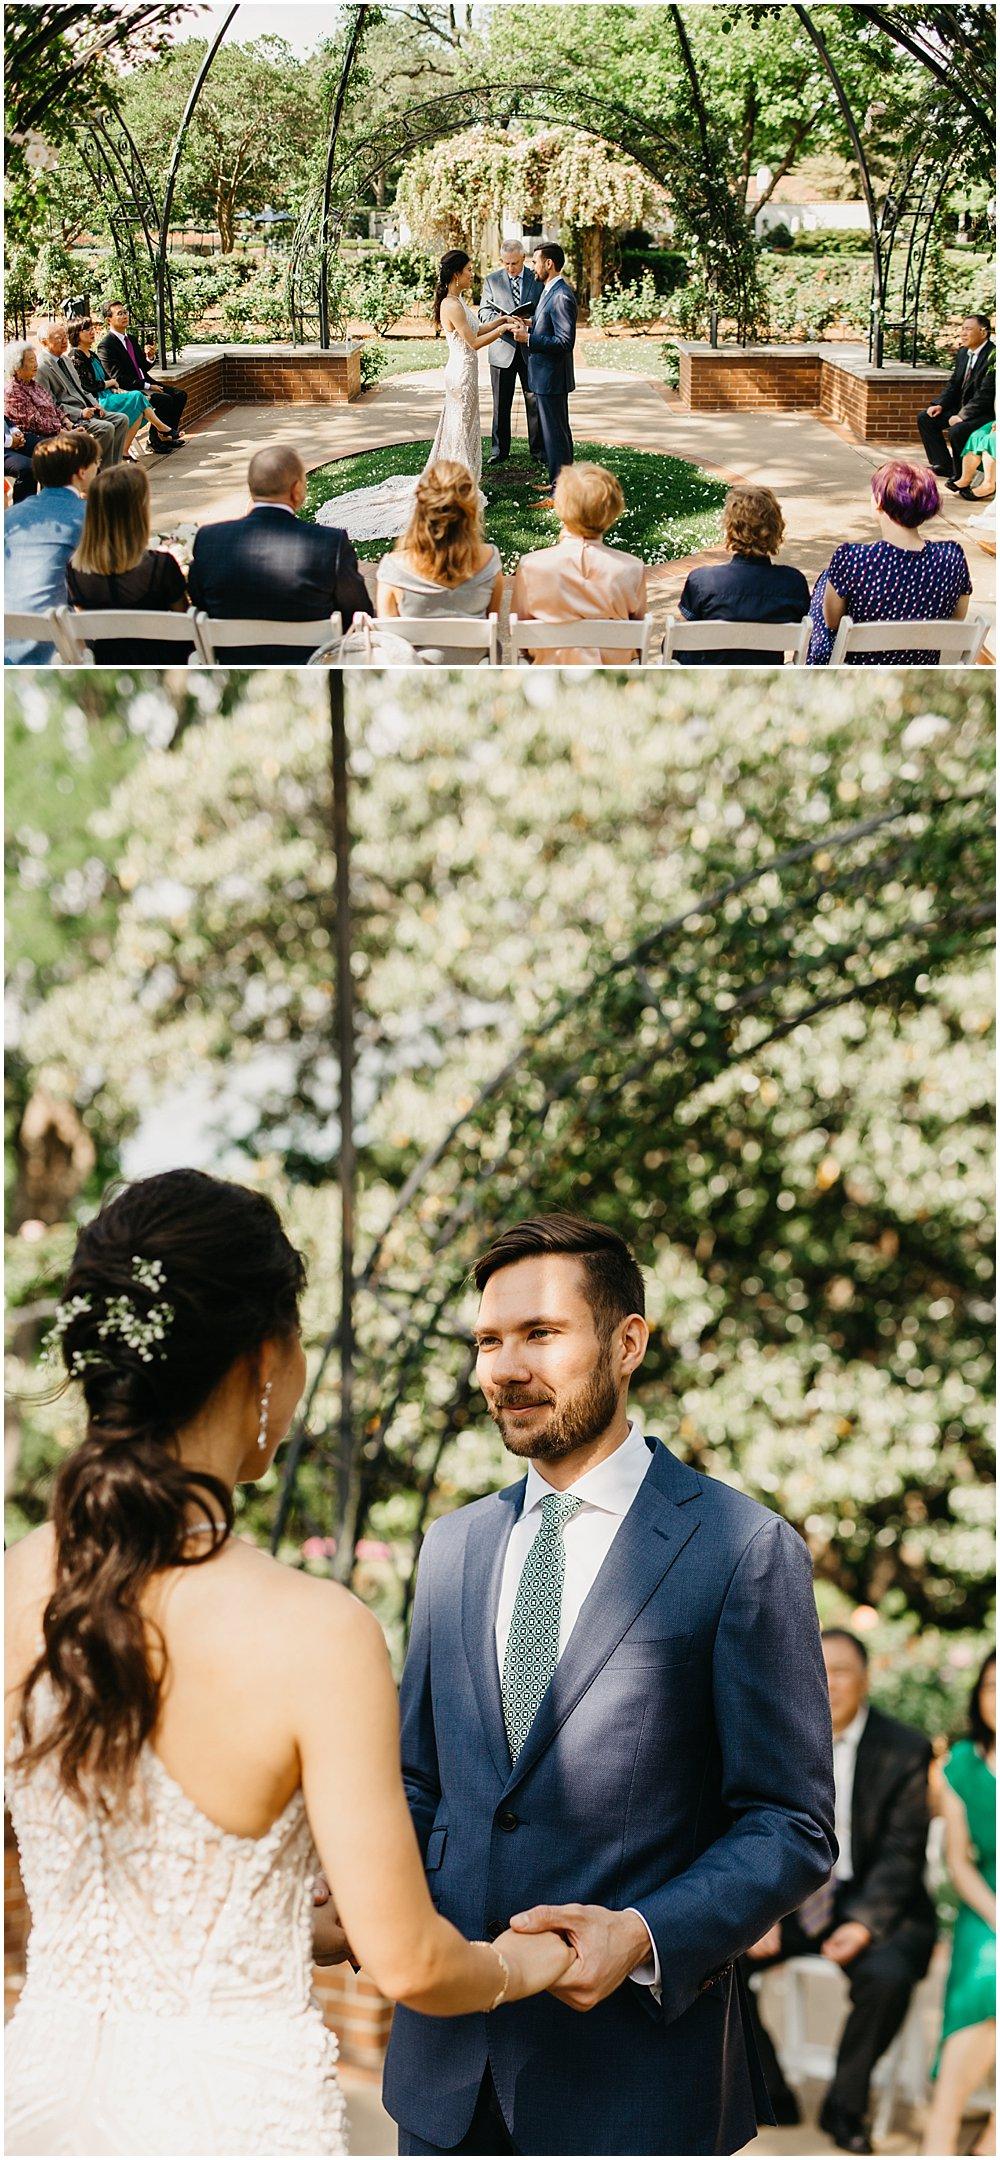 Becca Kracht Photography_Dallas_Texas_Wedding Photography_0078.jpg